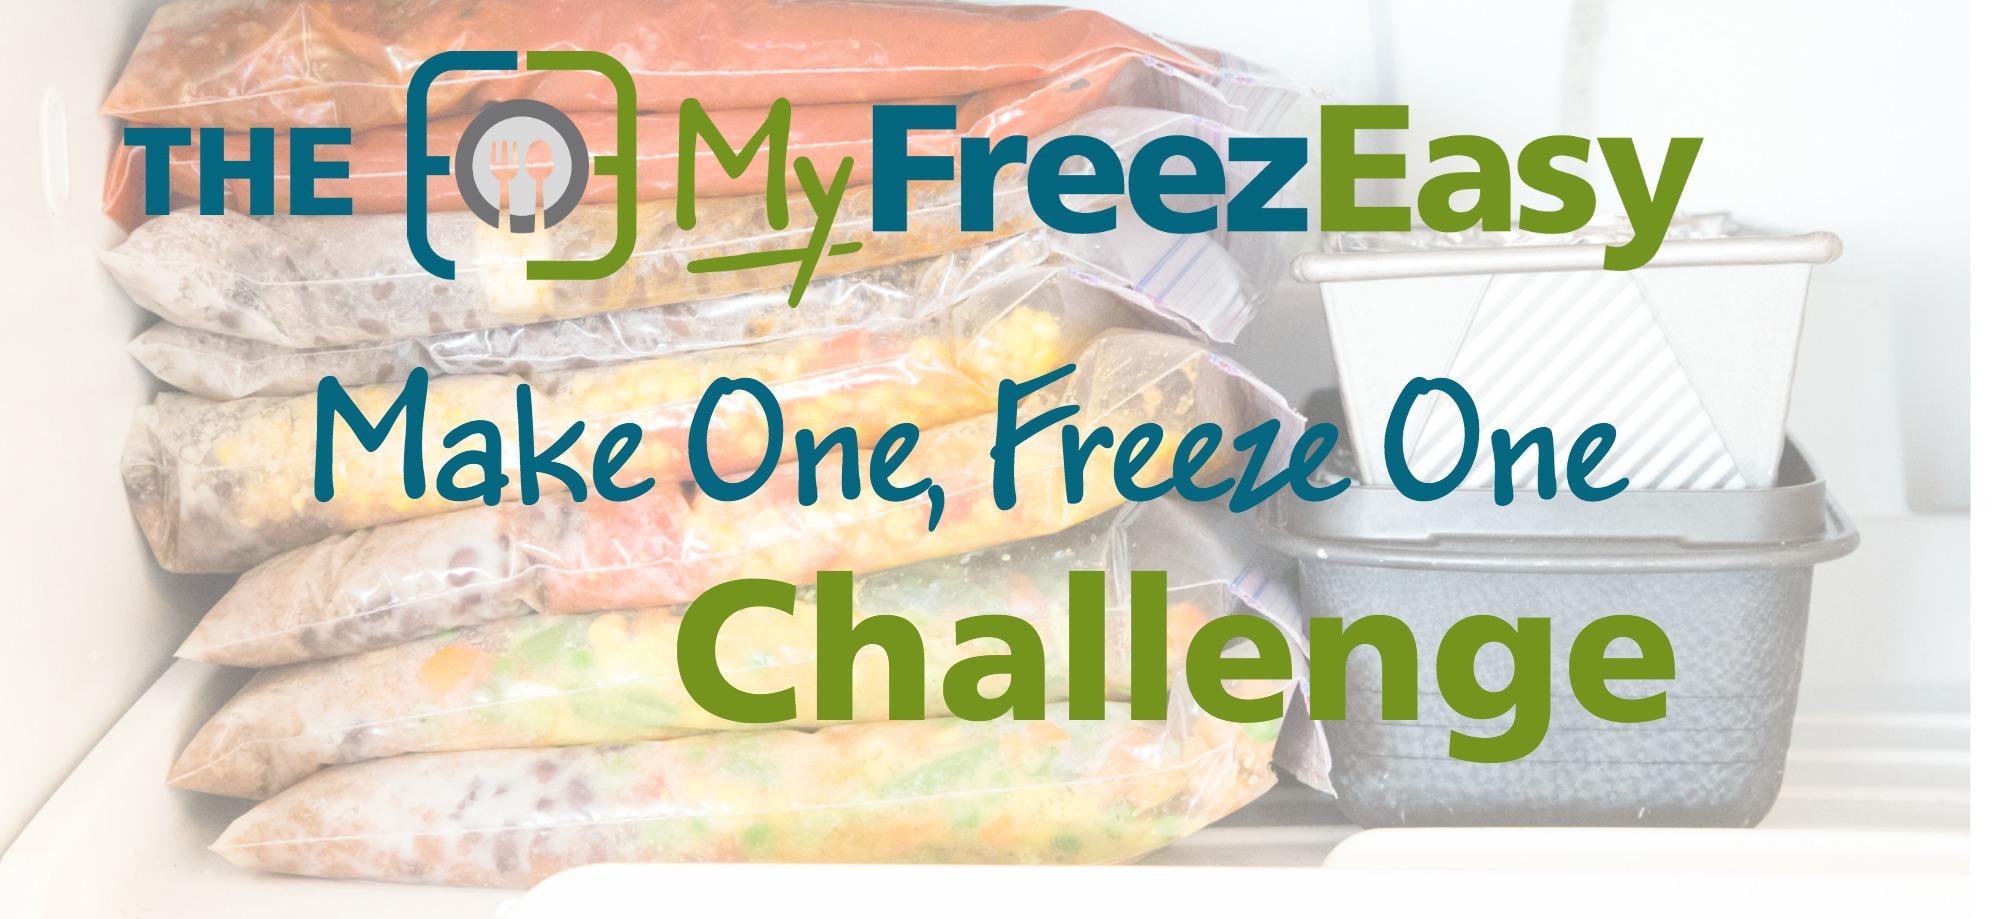 make one, freeze one challenge